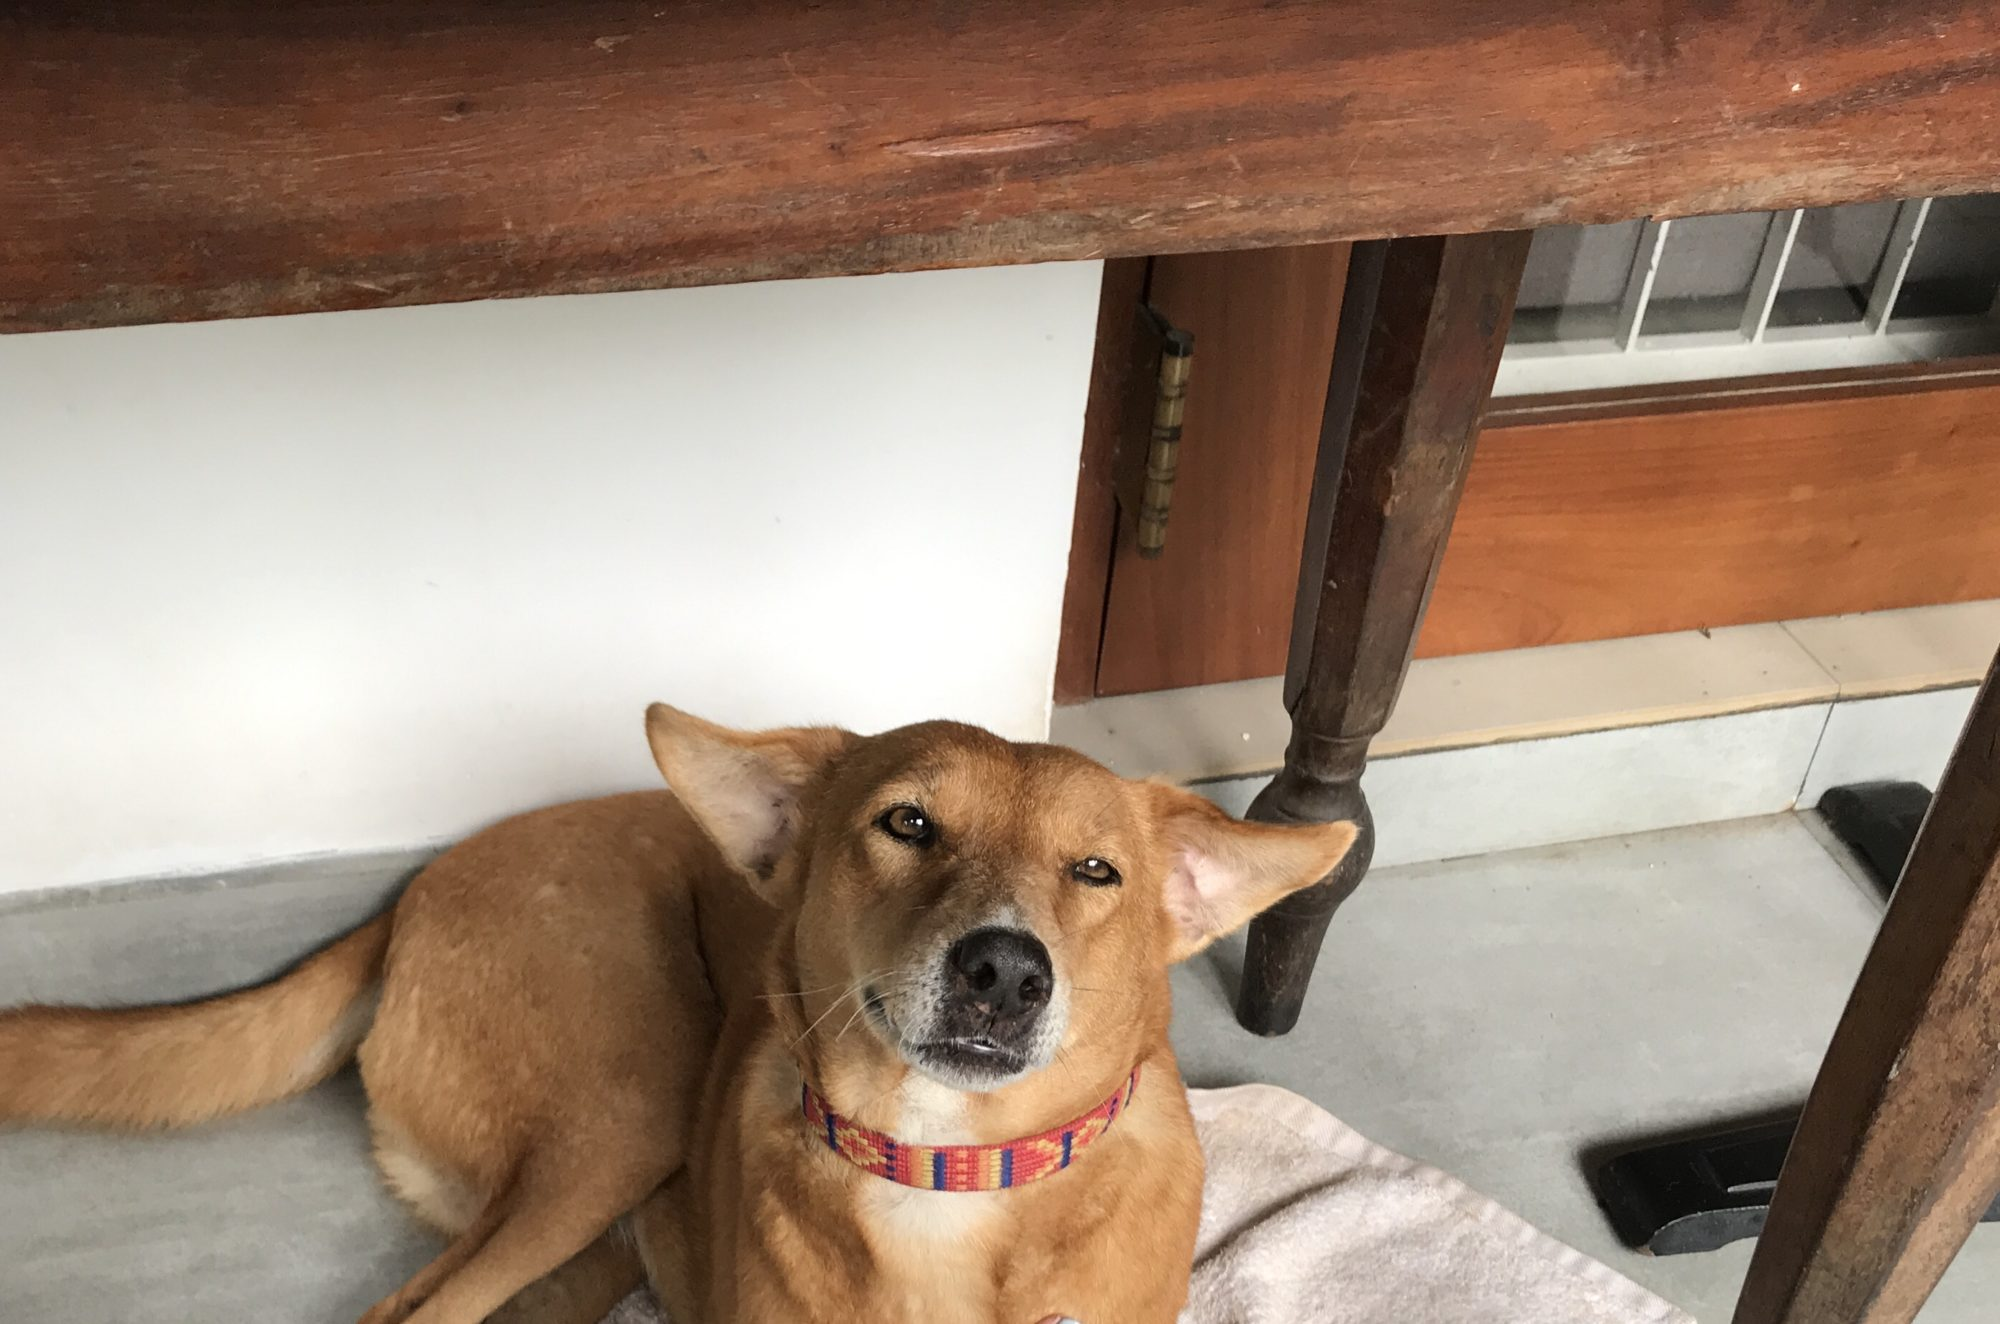 Lola the adopted Sri Lankan street dog